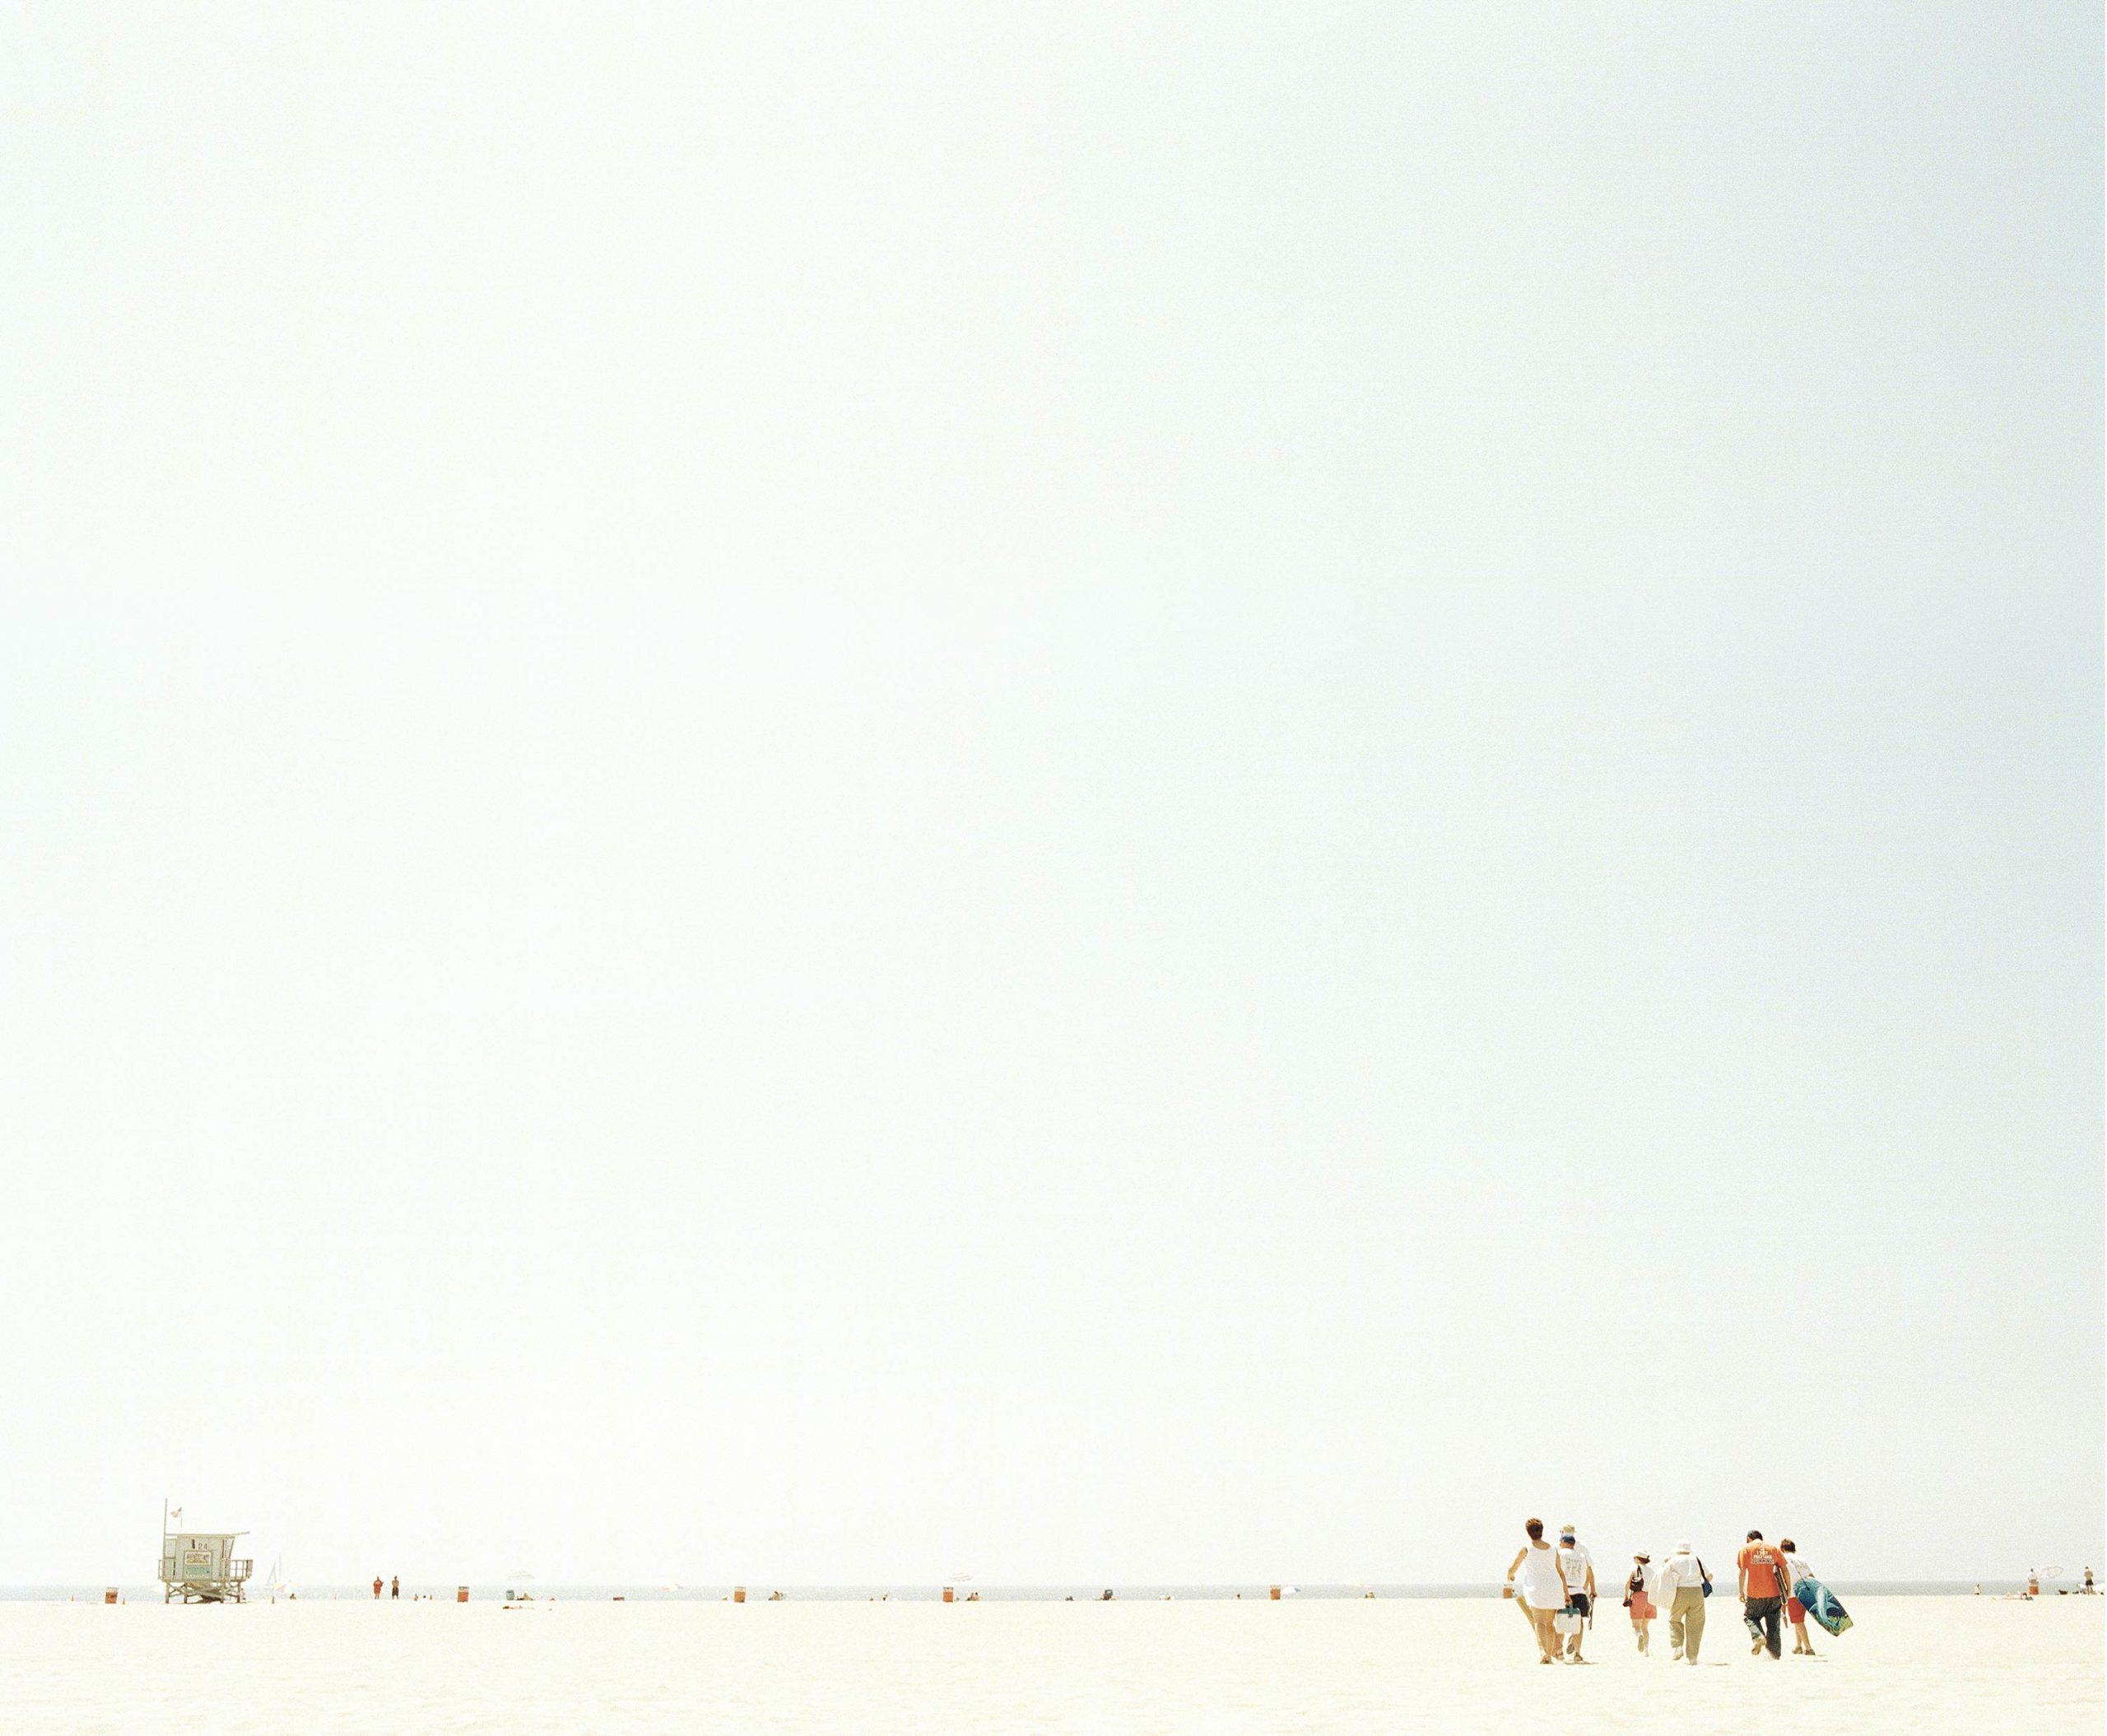 Venice Beach Walkers - Skate Park, Venice Beach Collection - Fine Art Photography by Toby Dixon